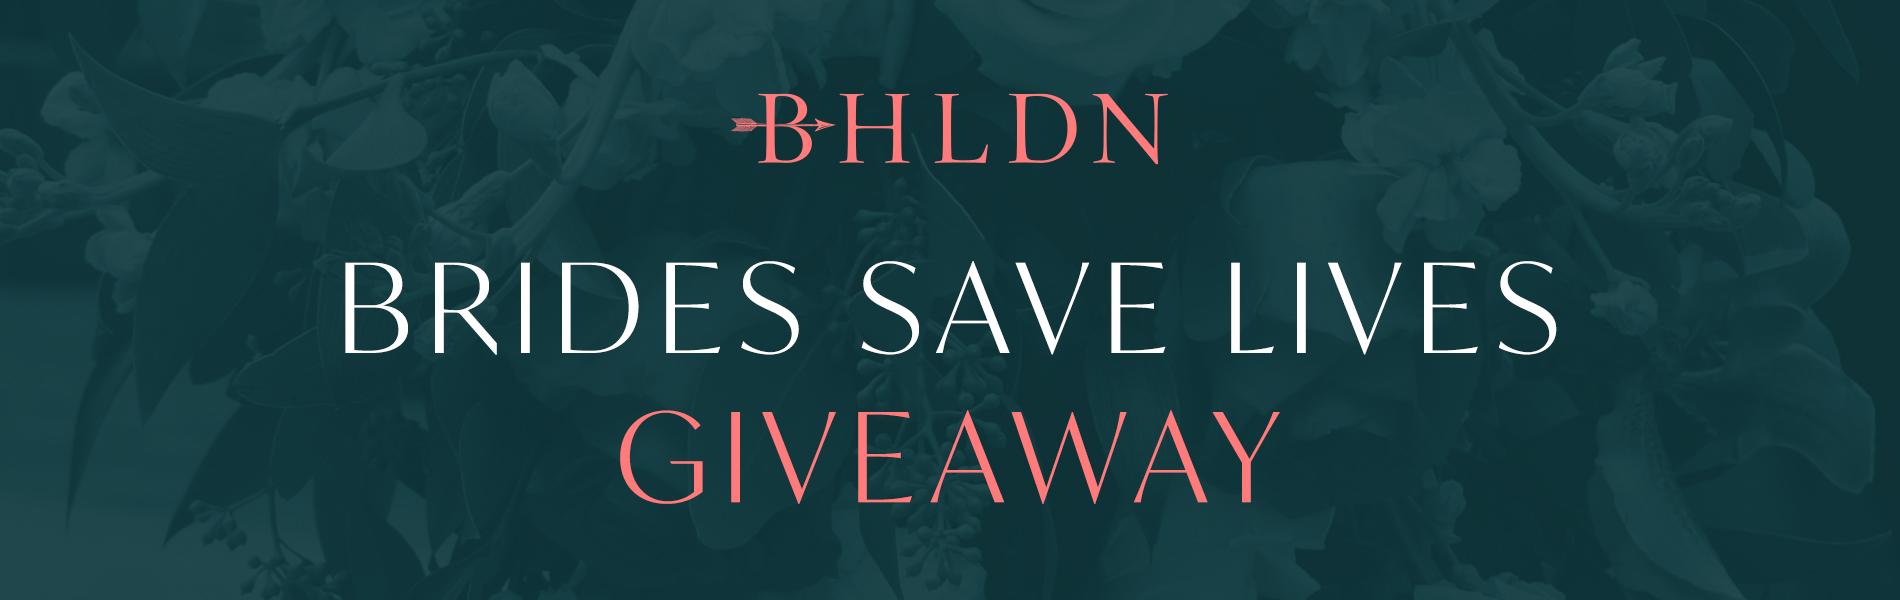 BHLDN Brides Save Lives image of flowers.